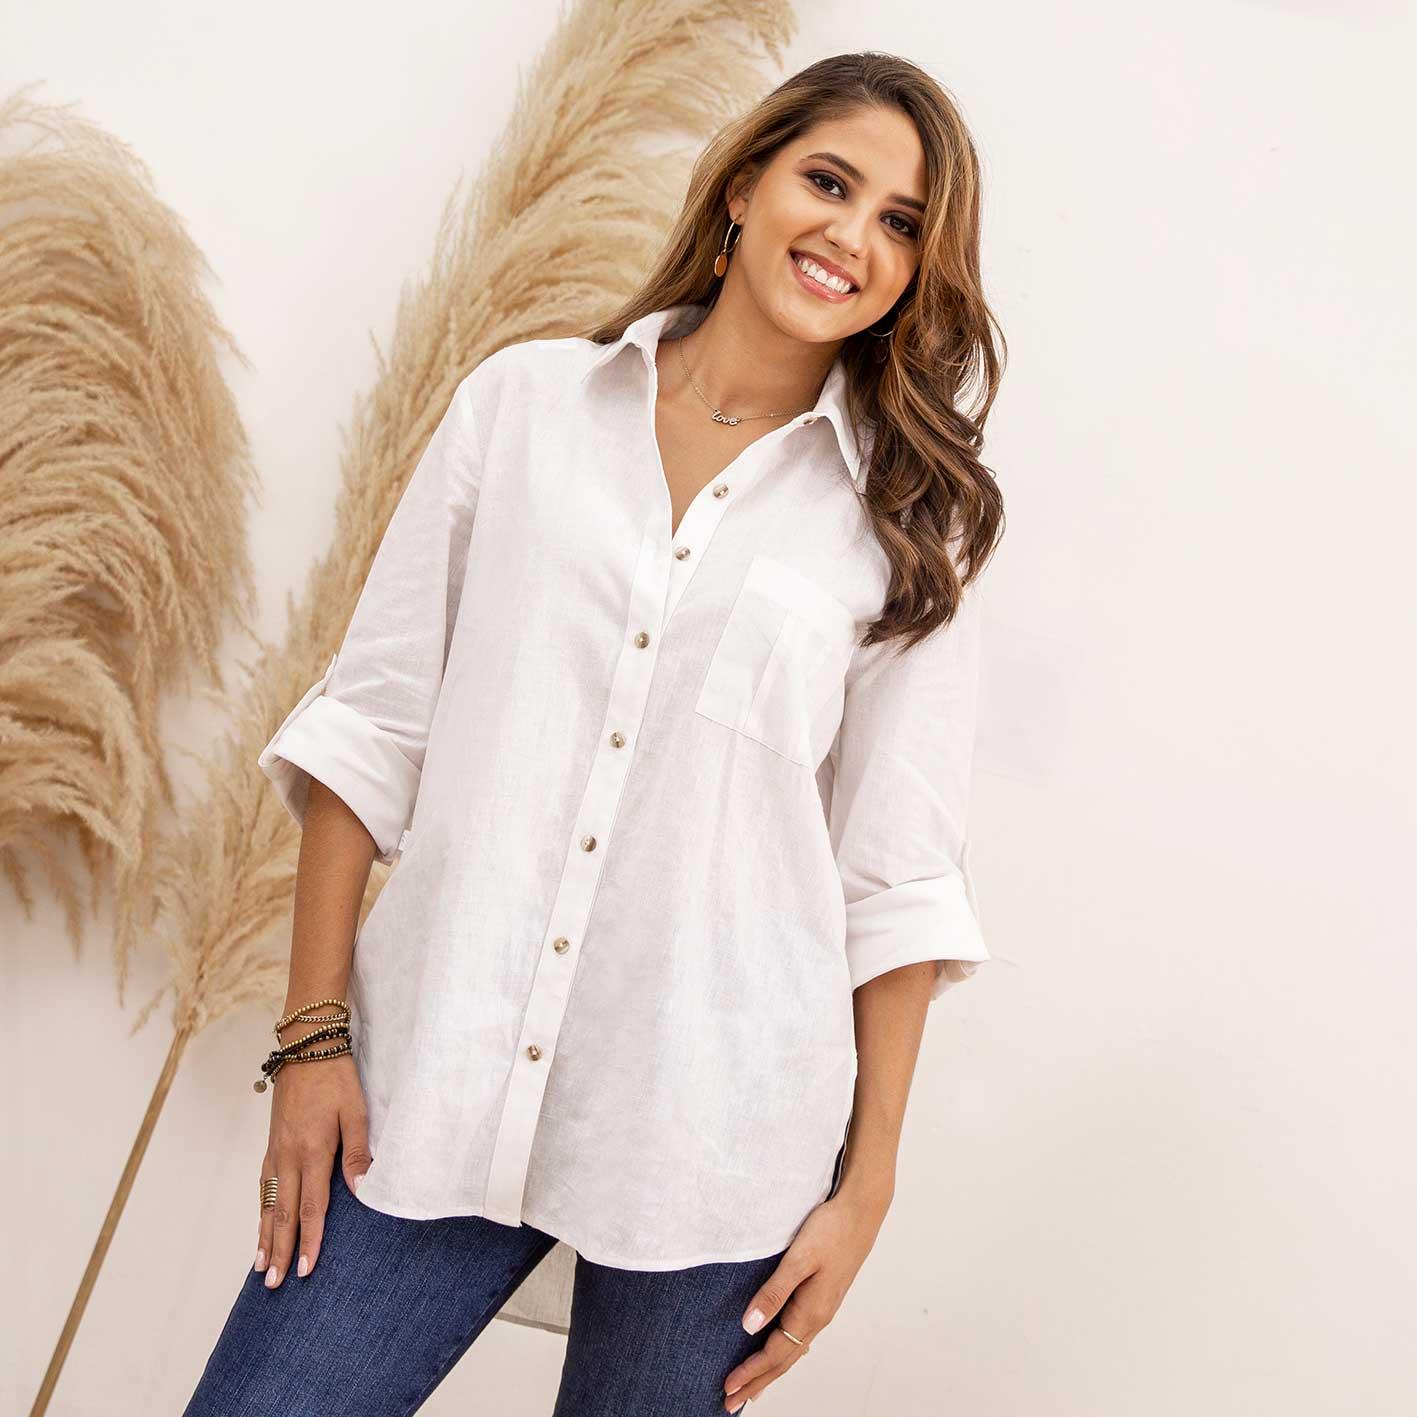 Camisa Lino Oversize Cod. 7210035